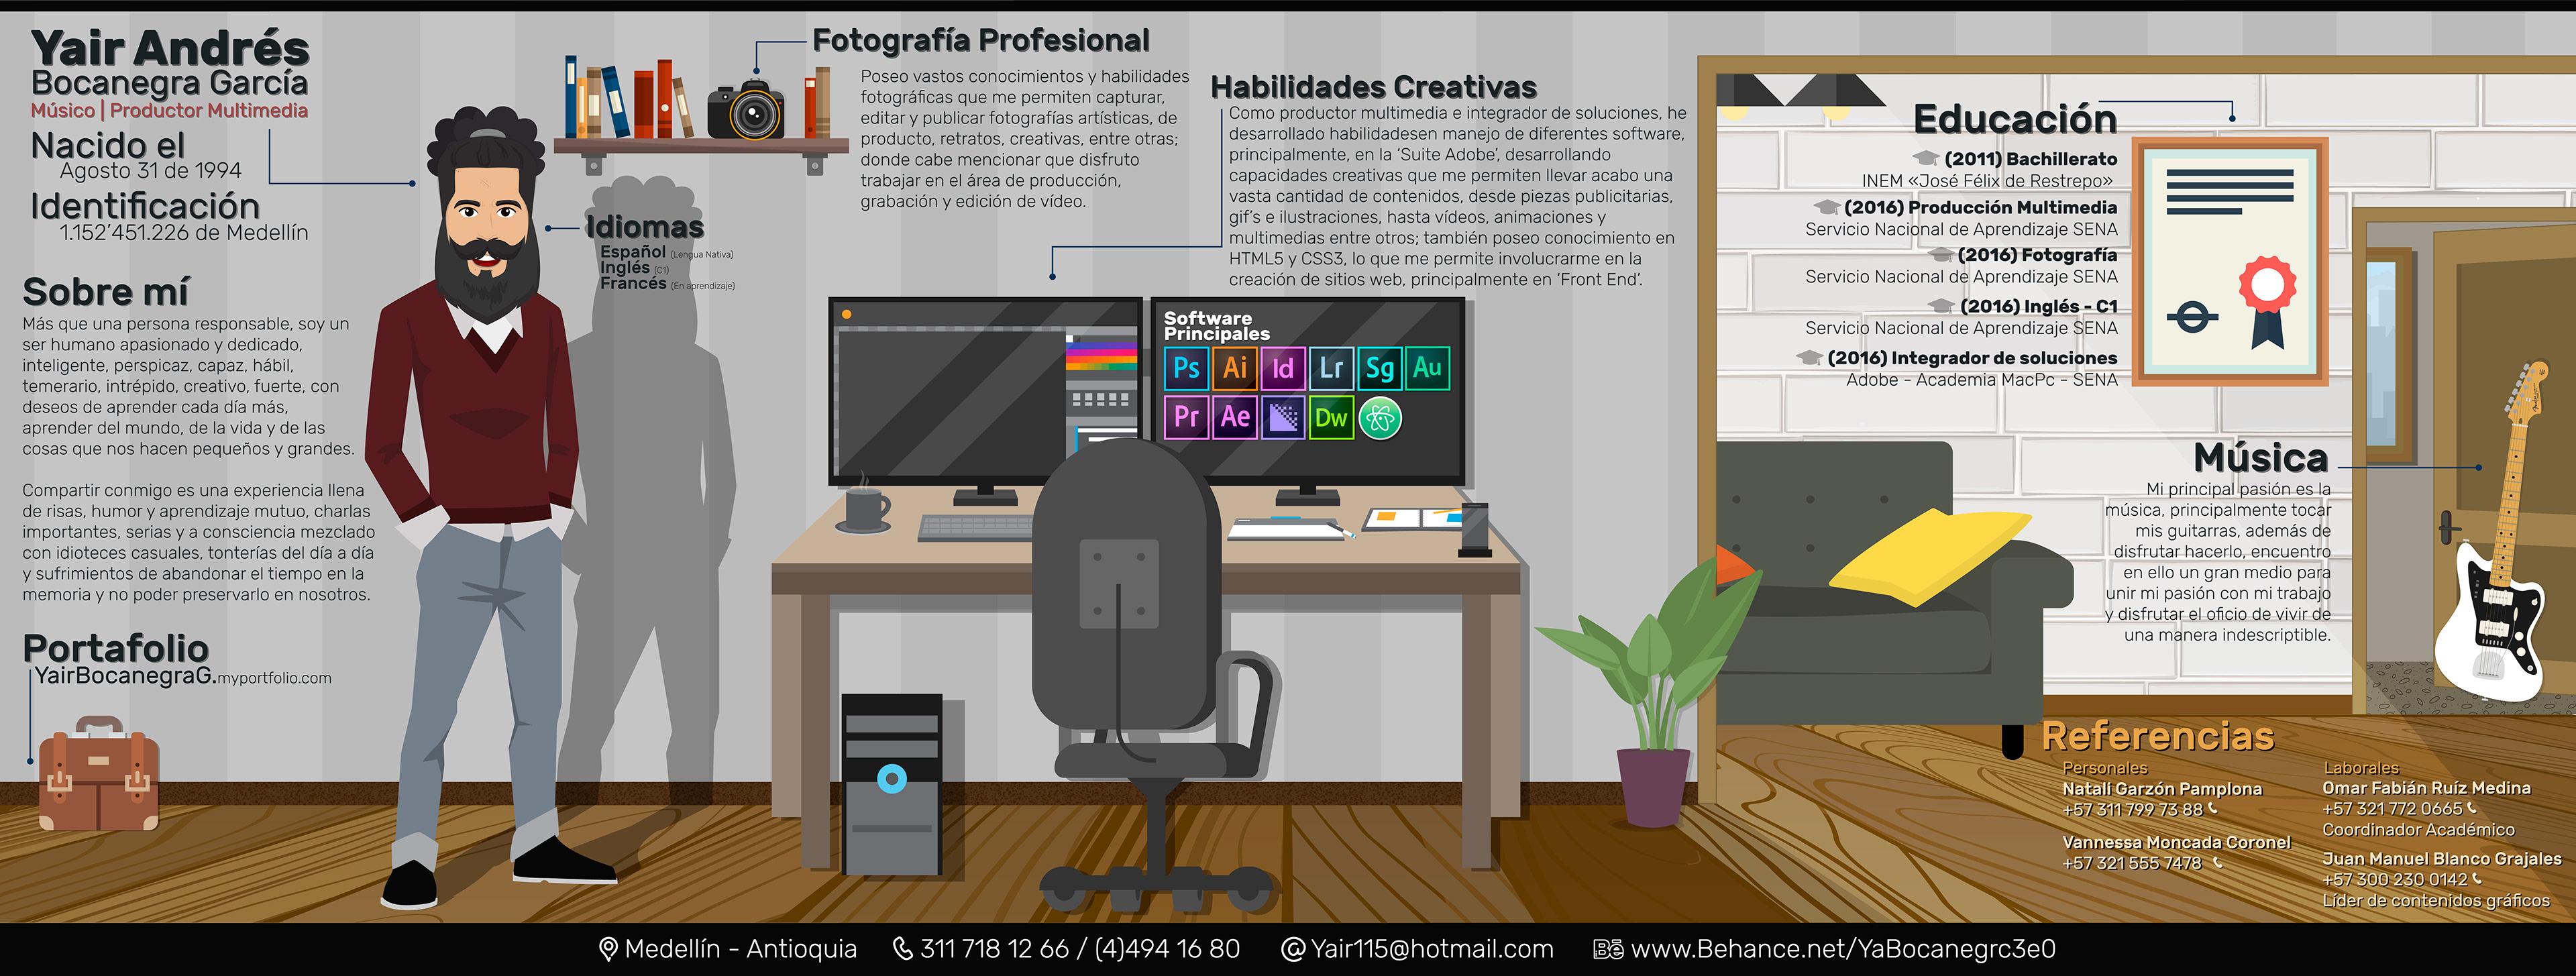 Yair Andrés Bocanegra García   Portafolio - Currículum Vitae